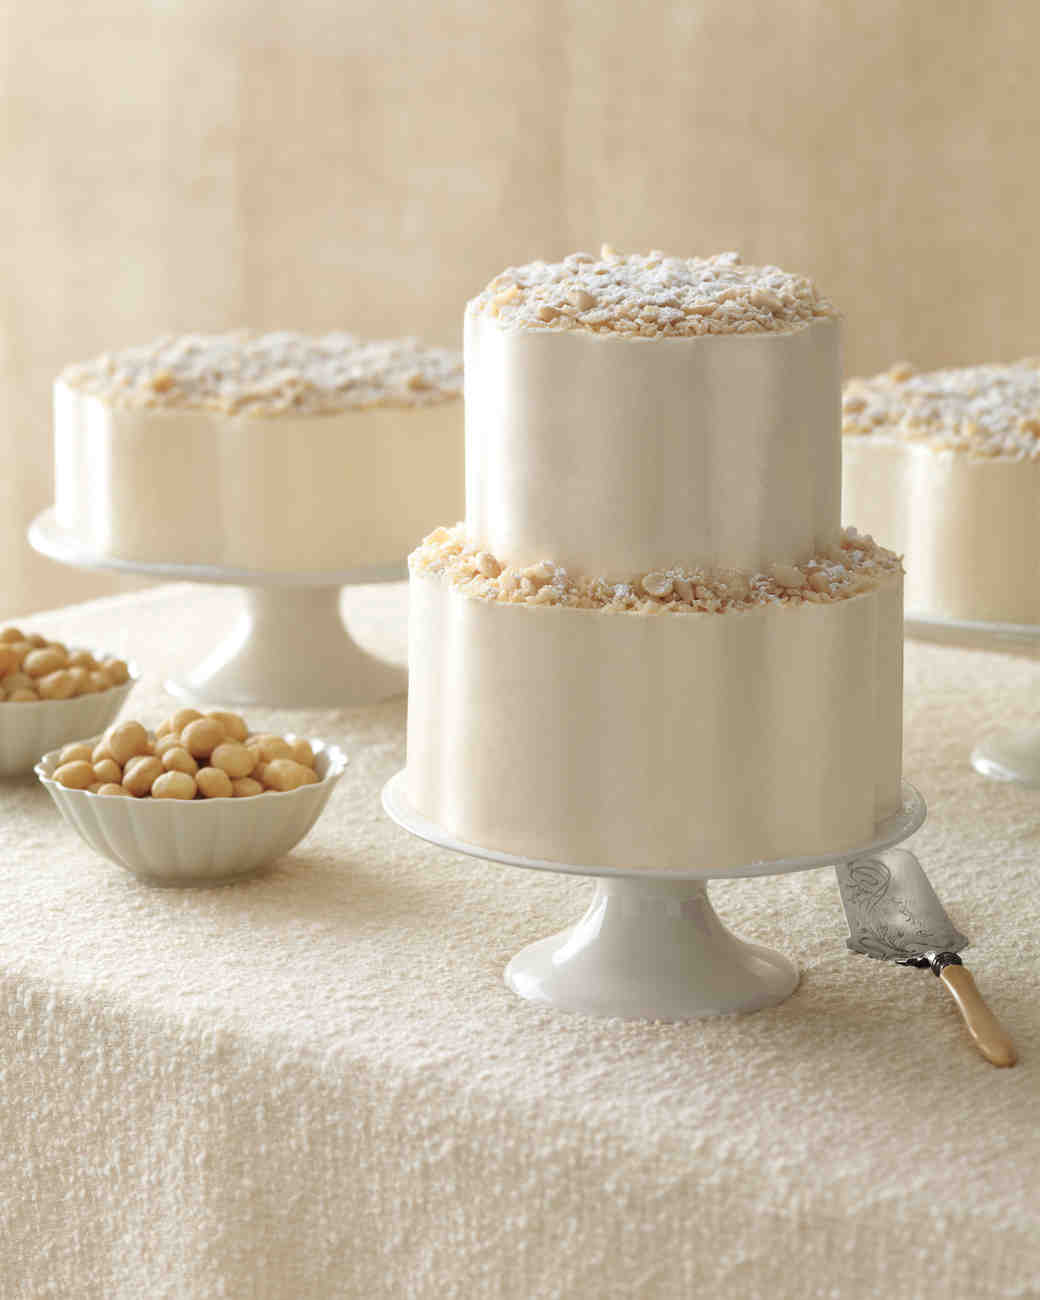 wedding-cakes-03-mwd108904.jpg